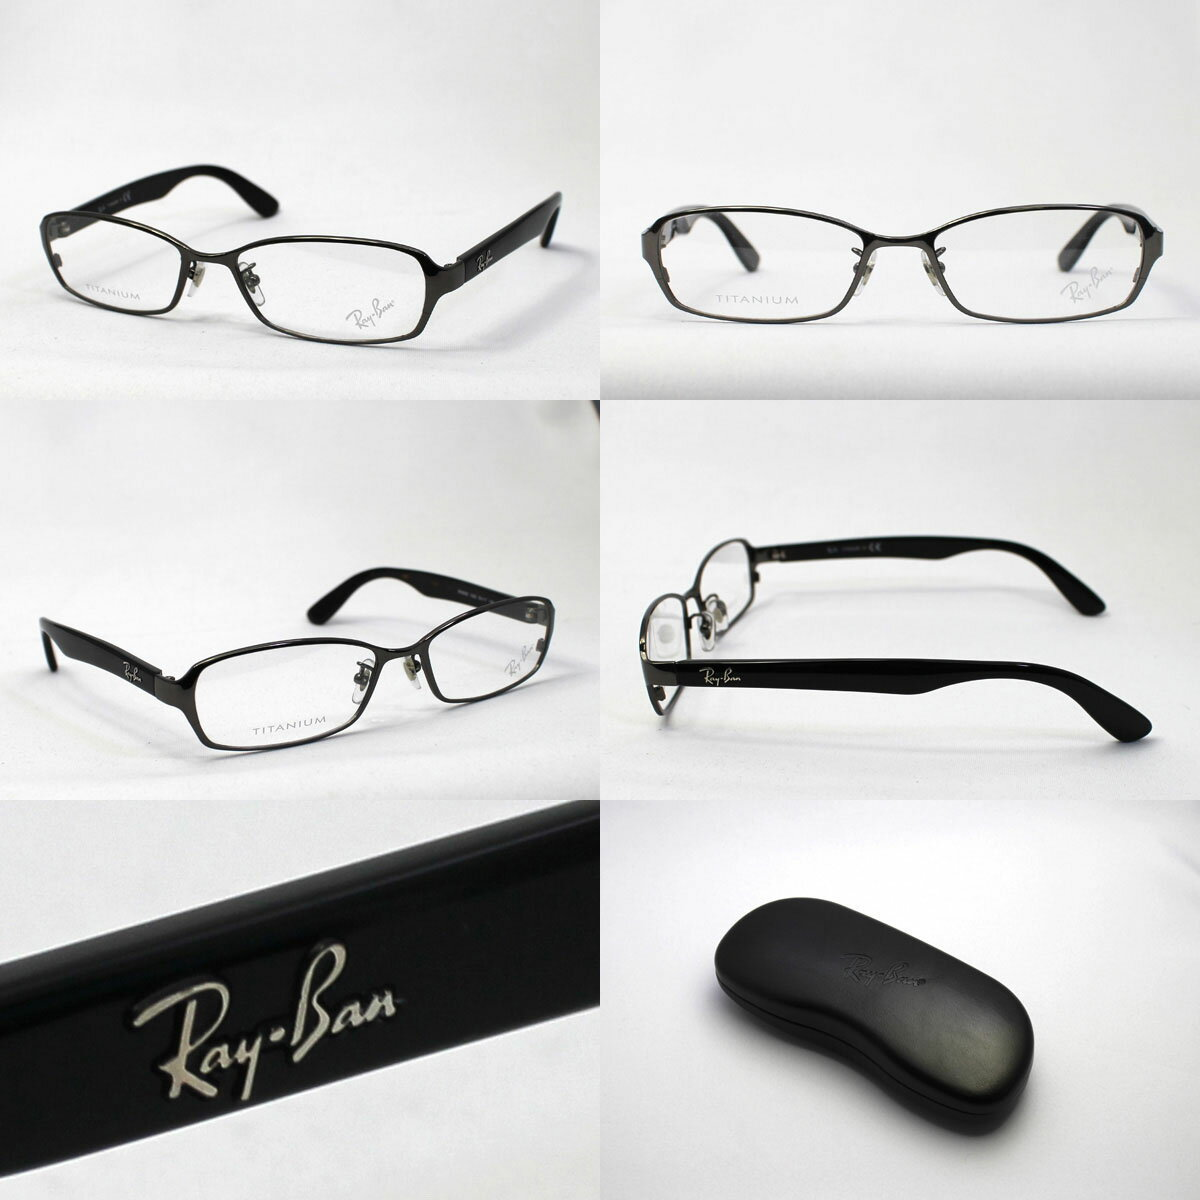 Titanium Frame Glasses Philippines : glassmania Rakuten Global Market: RX8690 1000 RayBan Ray ...